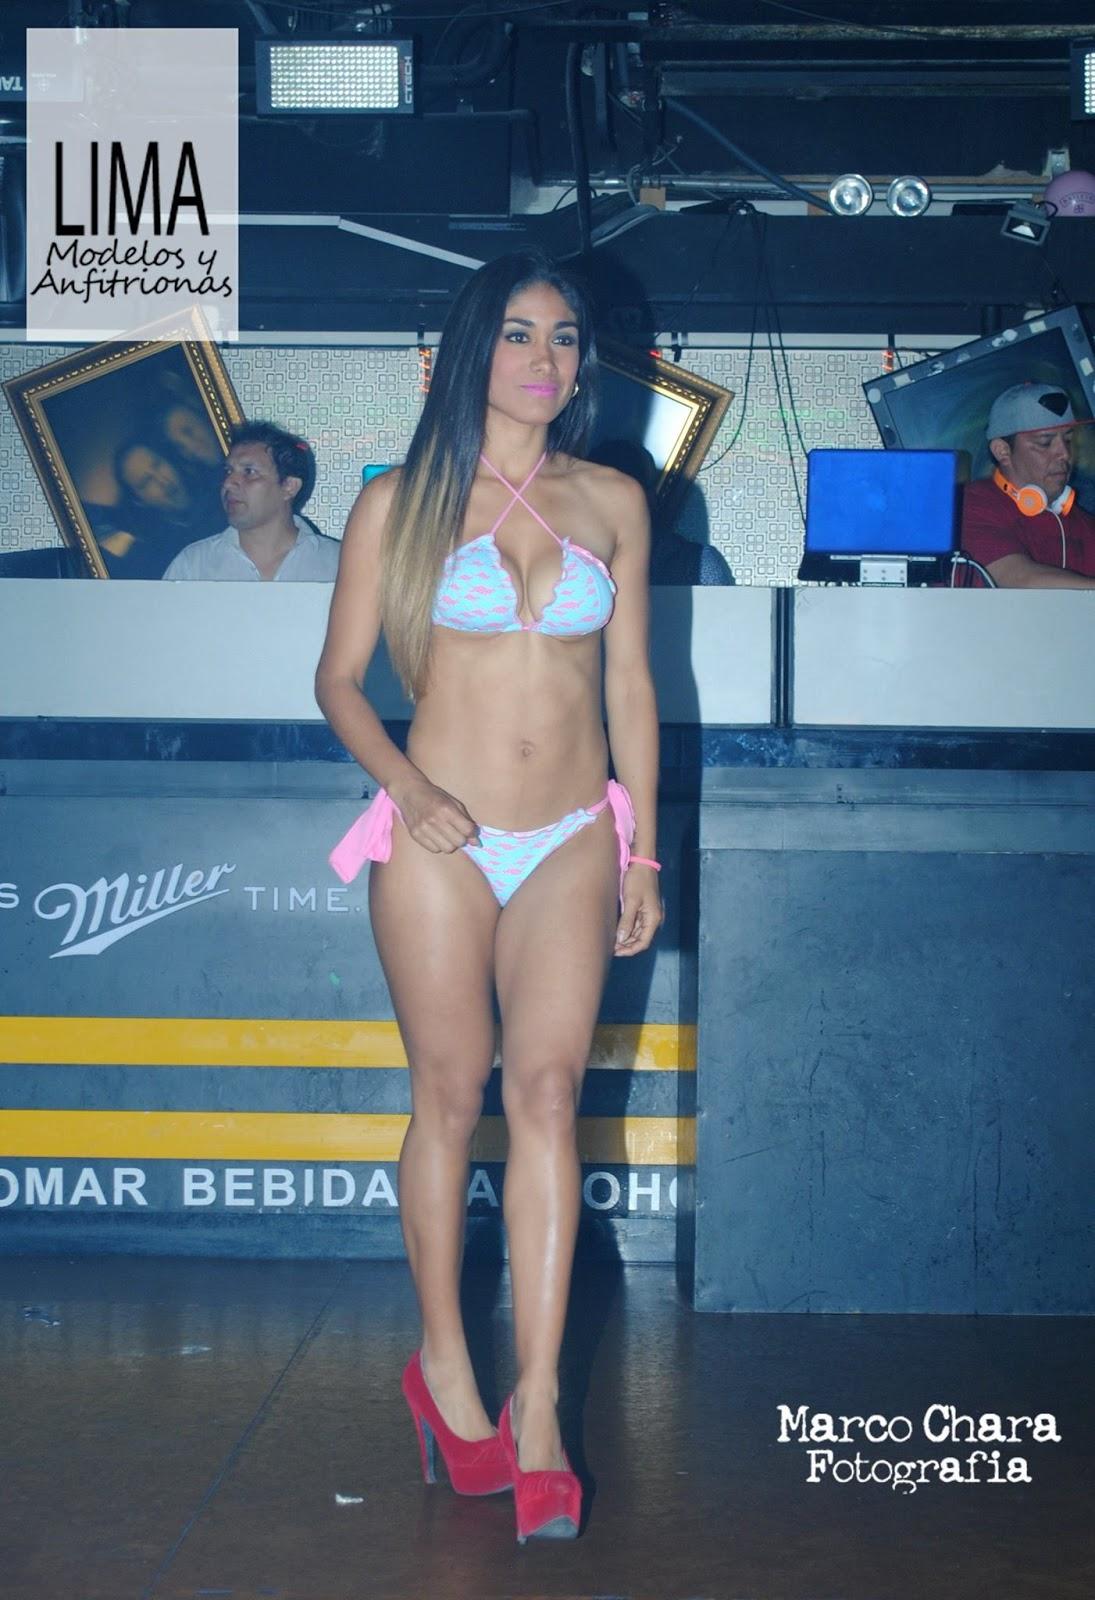 Laura valentina avila martinez - 3 2